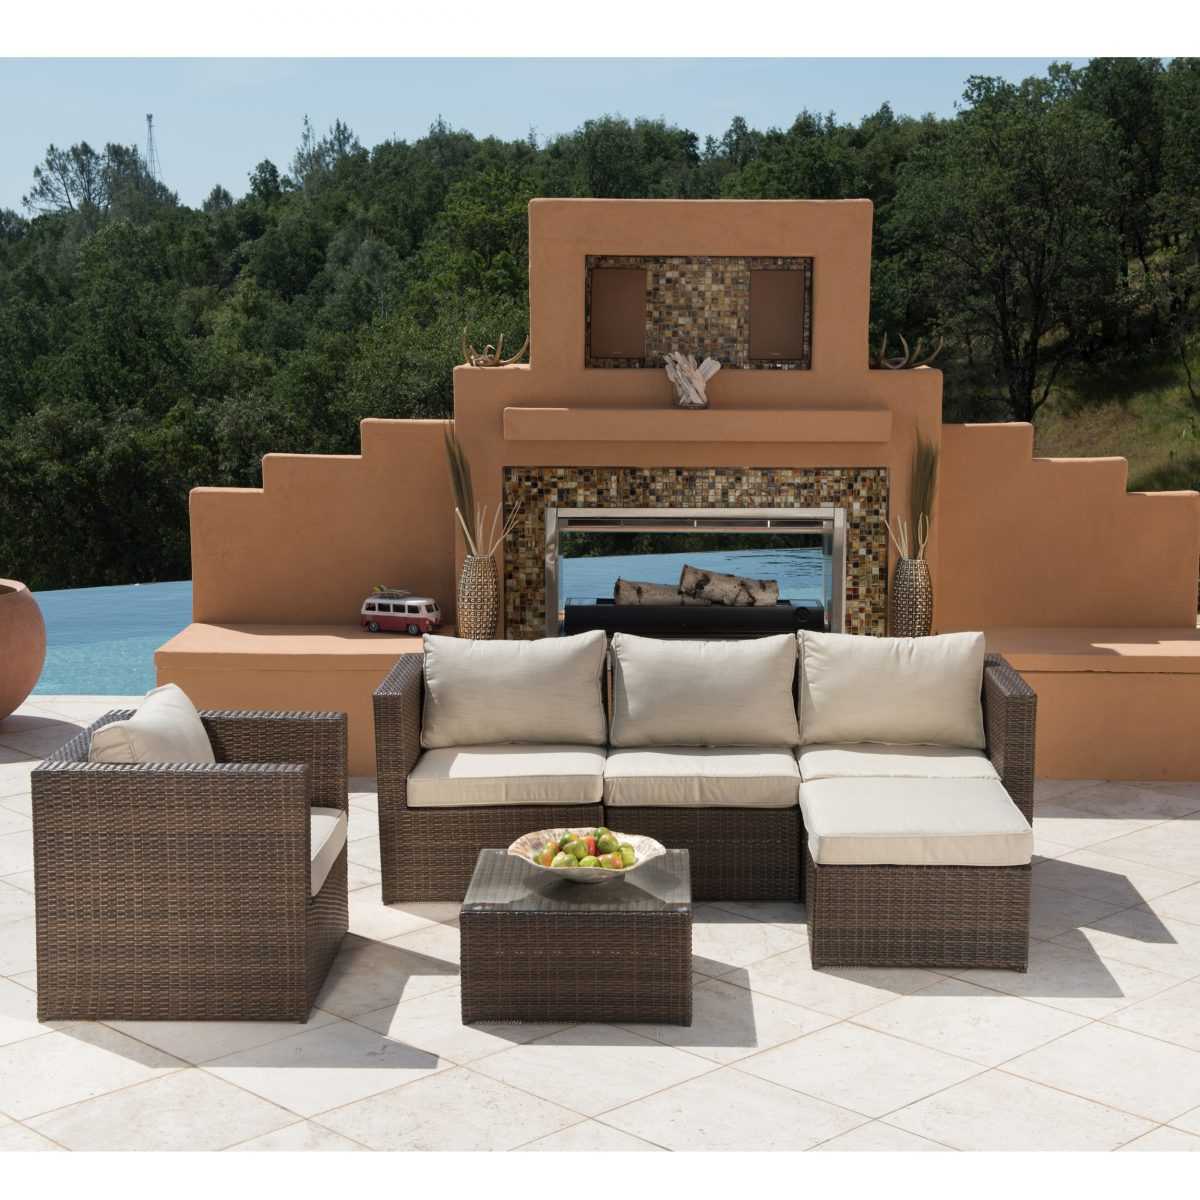 Borealis Trey 6-piece Brown and Beige Resin Wicker Outdoor Furniture ...